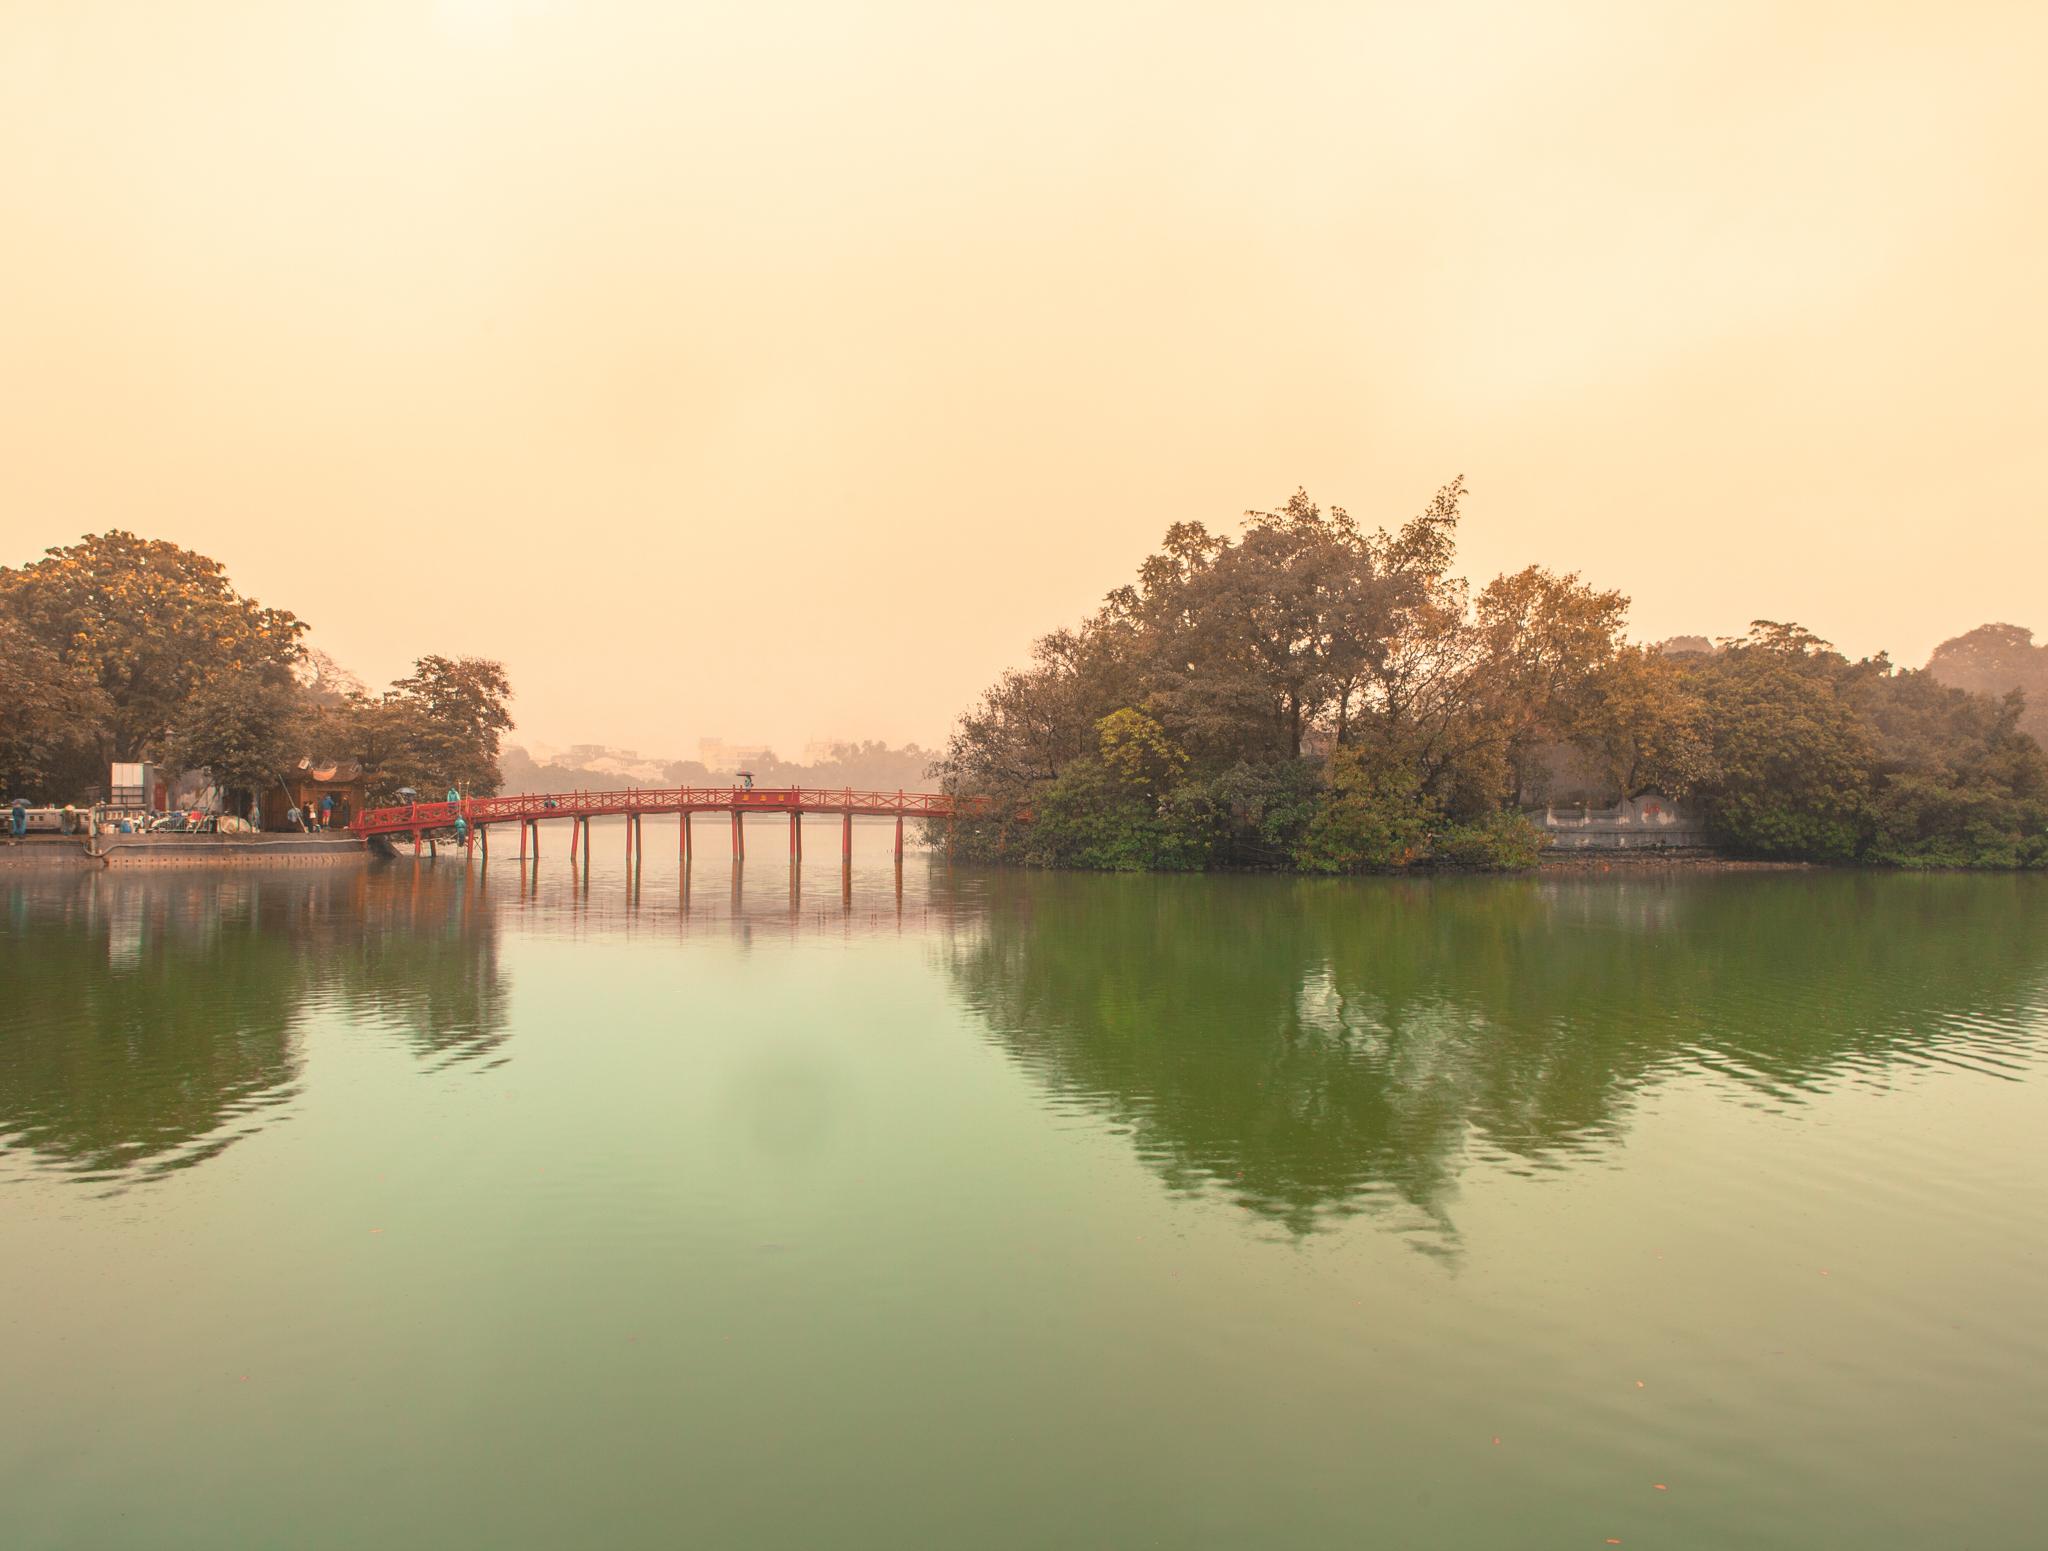 Vietnam Hanoi red bridge landscape photography